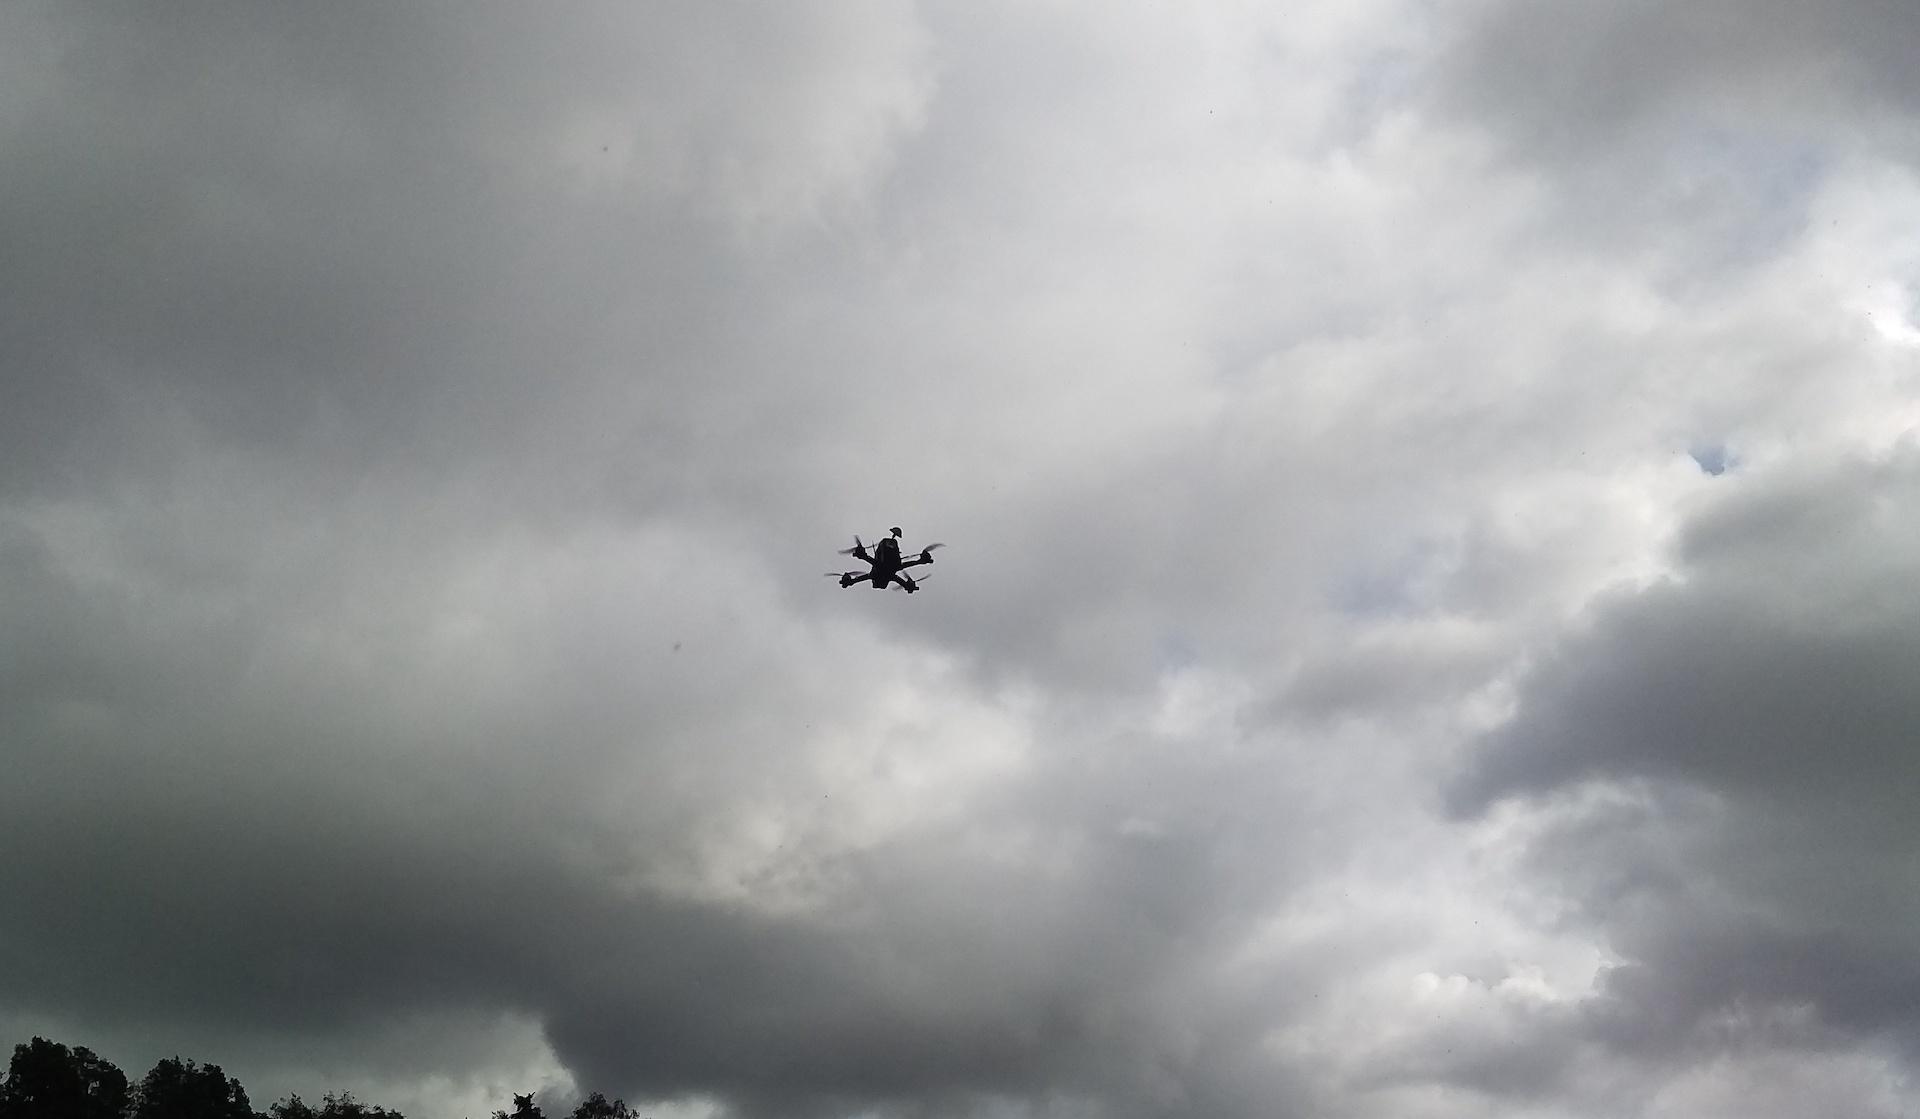 test-flight-weather-gone-bad